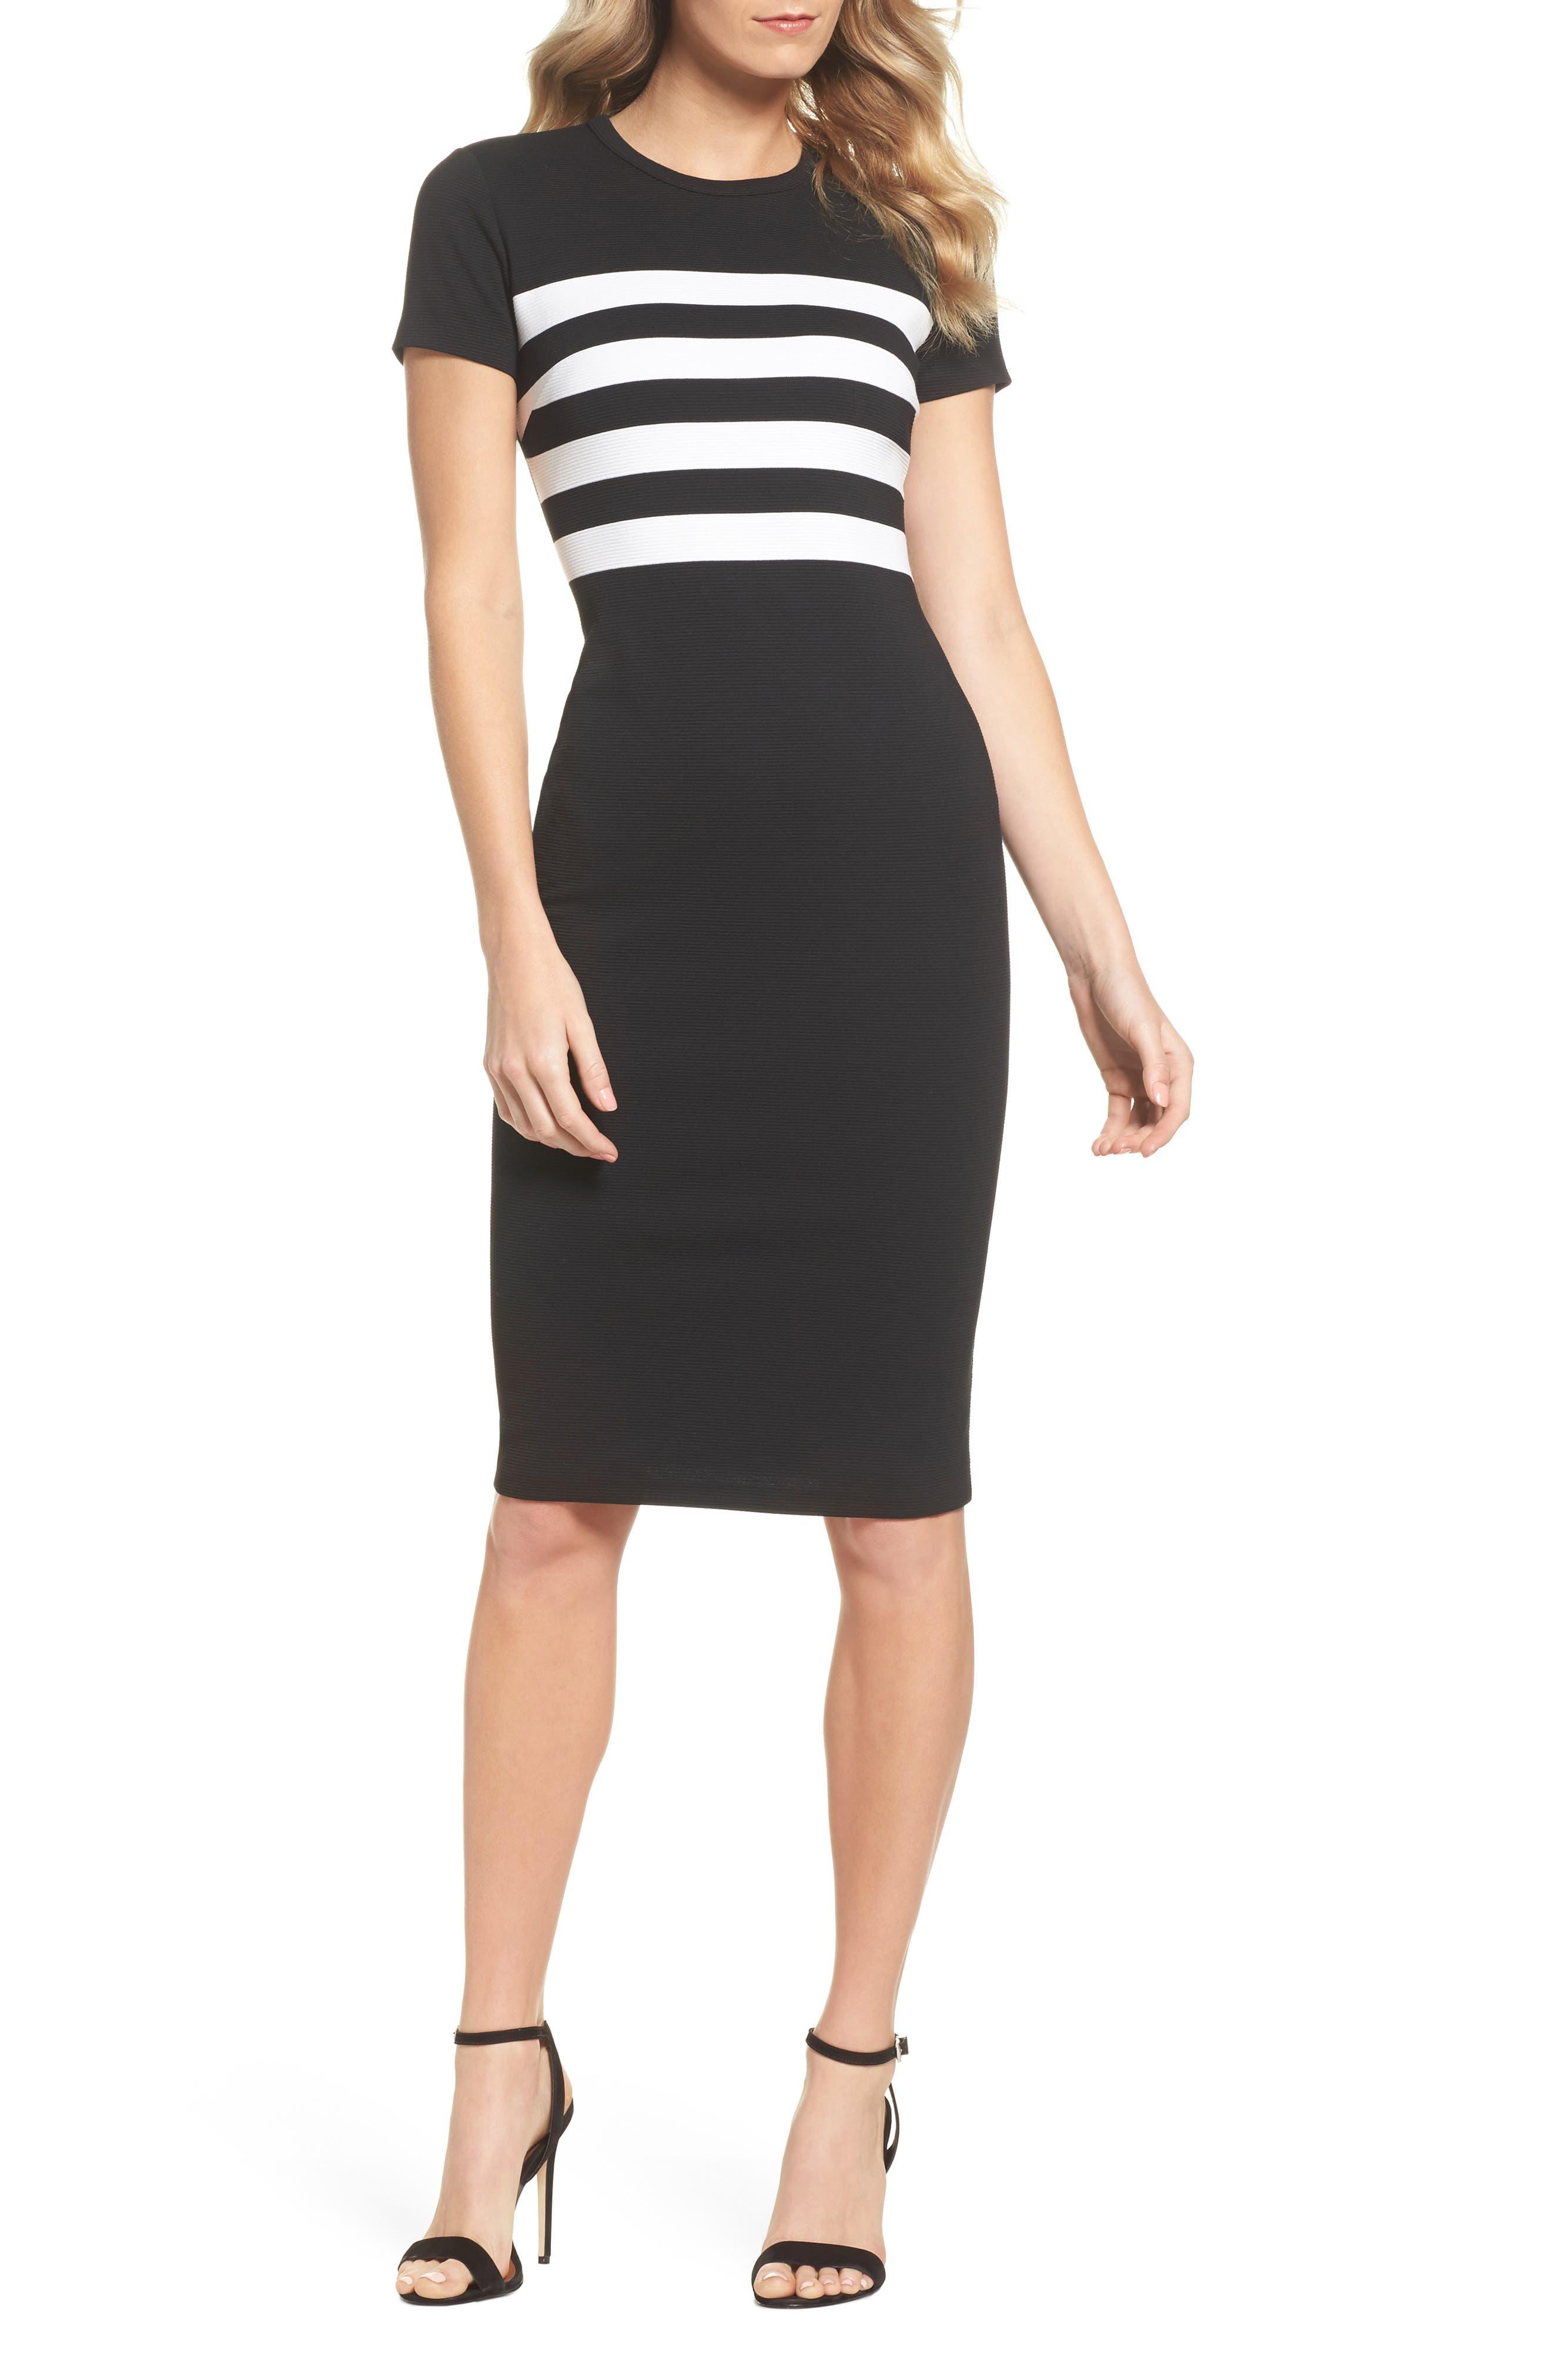 Stripe Ottoman Sheath Dress,                             Main thumbnail 1, color,                             Black/ White